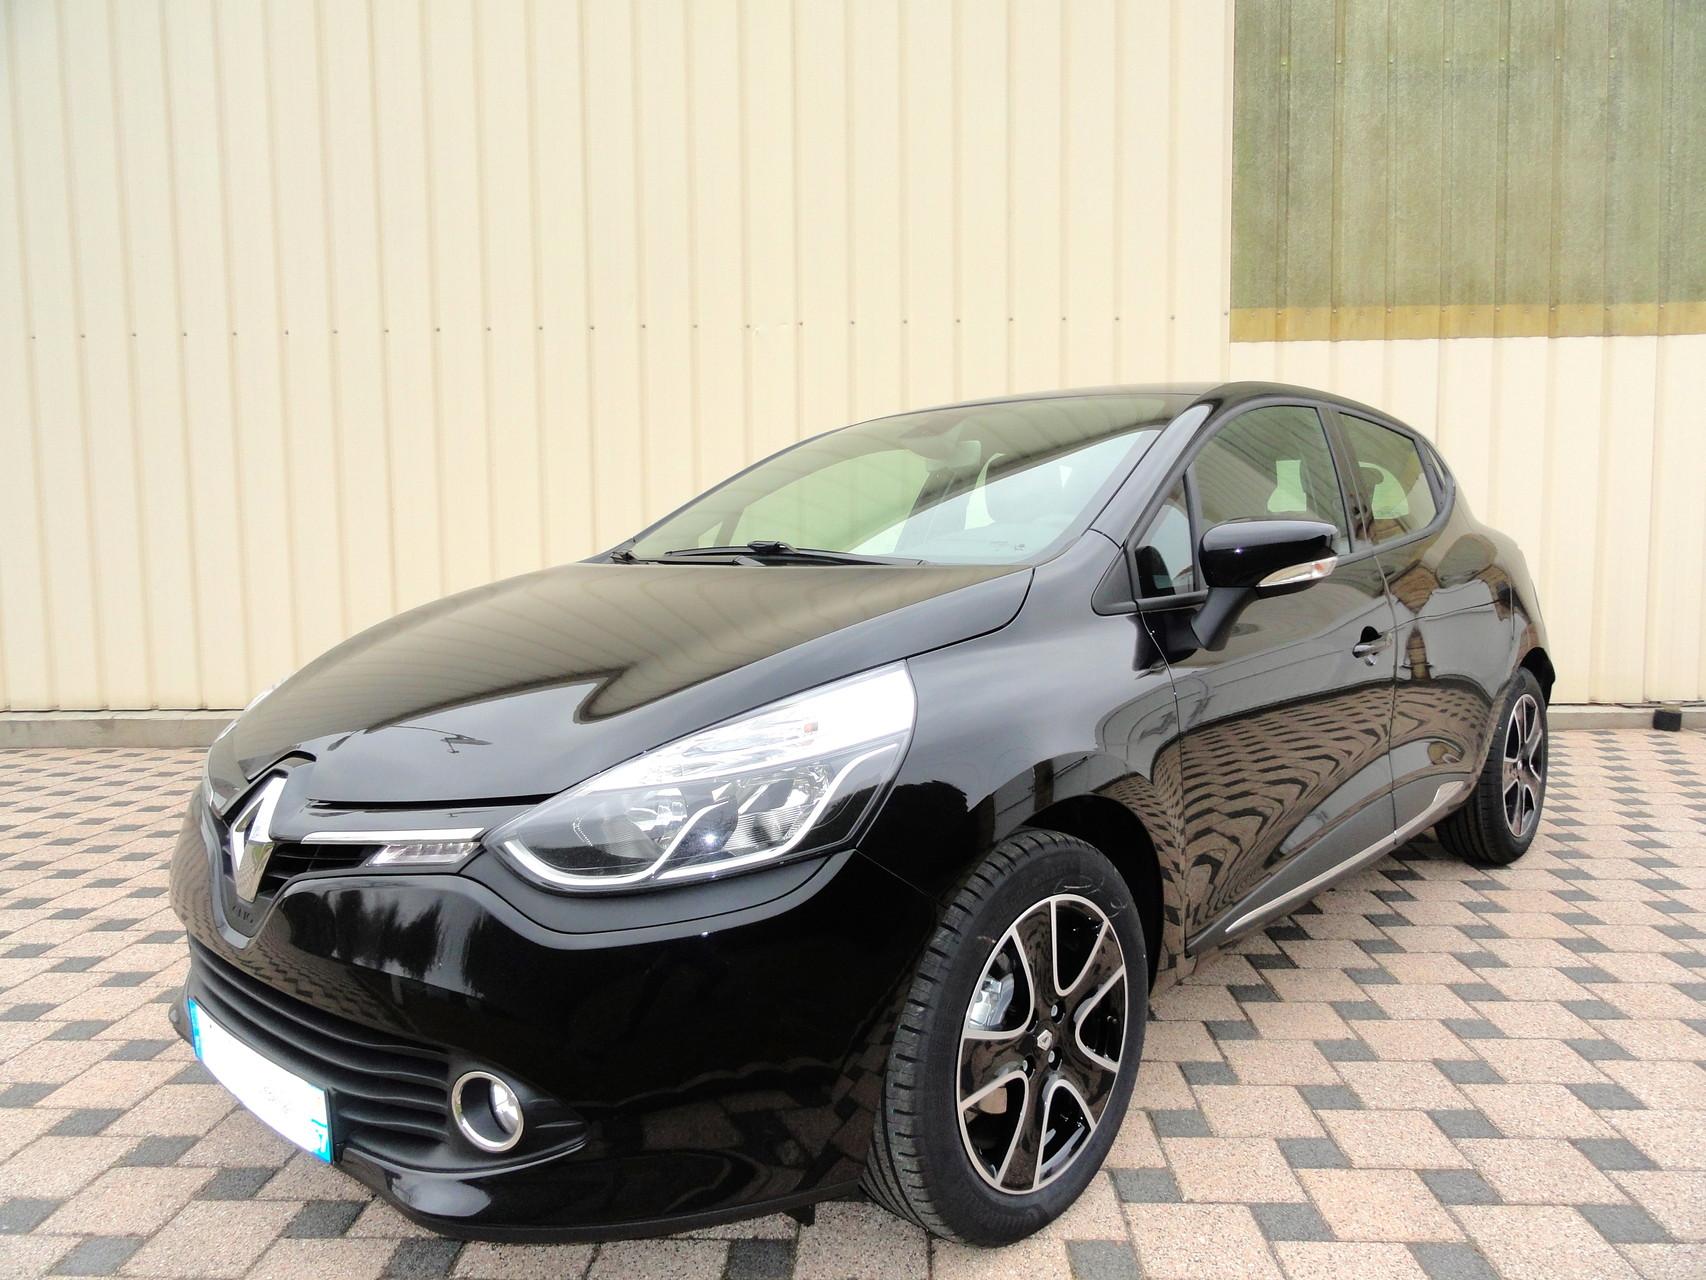 Renault Clio IV 1.5 DCI 90 CV Intens  (NEUF 0 KM)